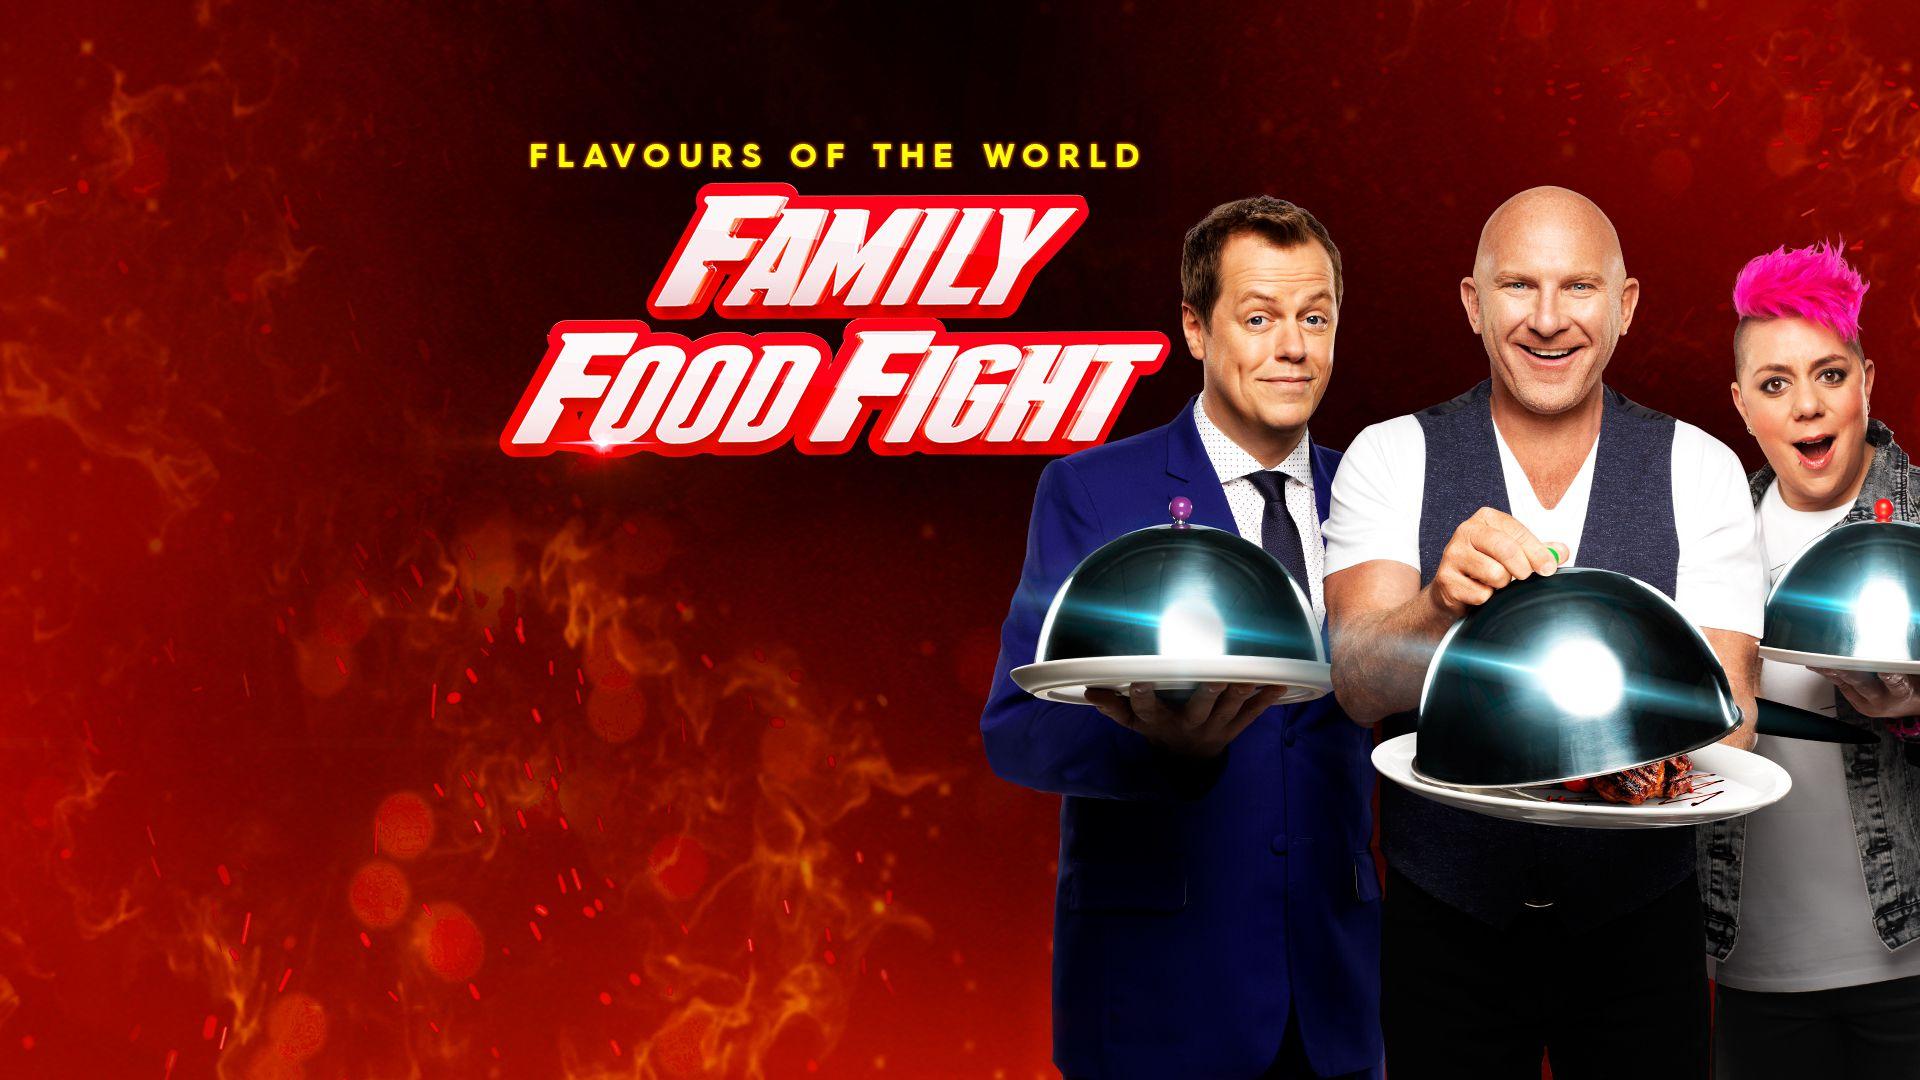 Watch Family Food Fight Season 2, Catch Up TV